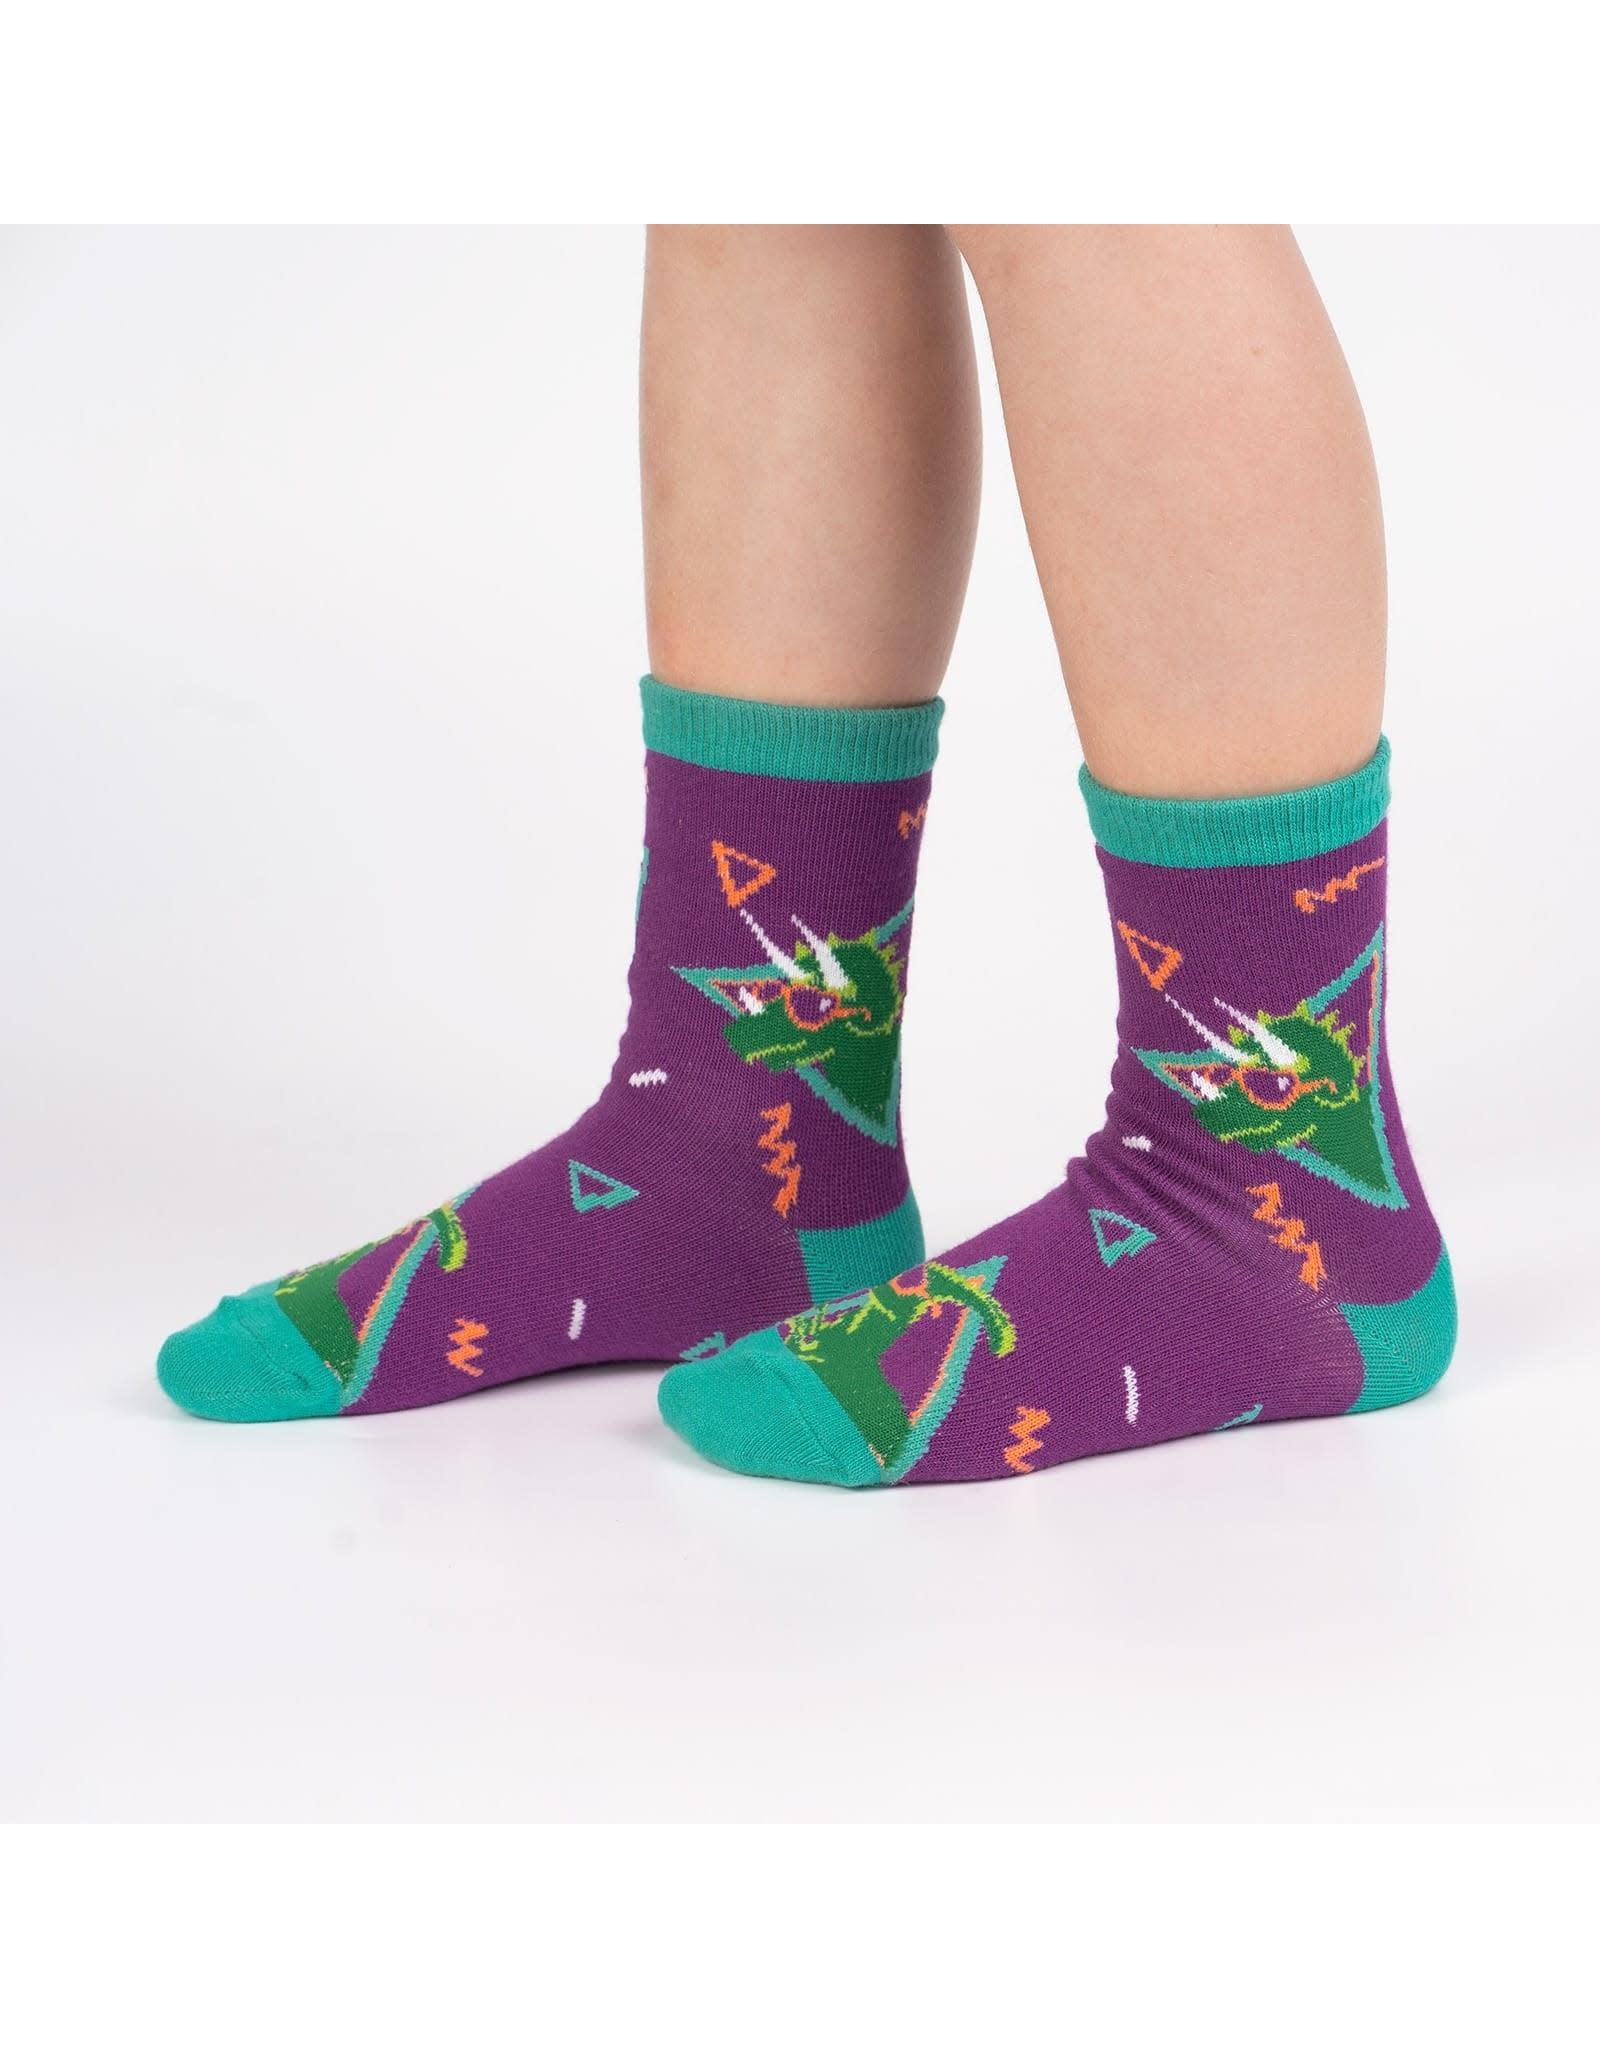 SOCK IT TO ME - Junior Jurassic Party Crew Socks